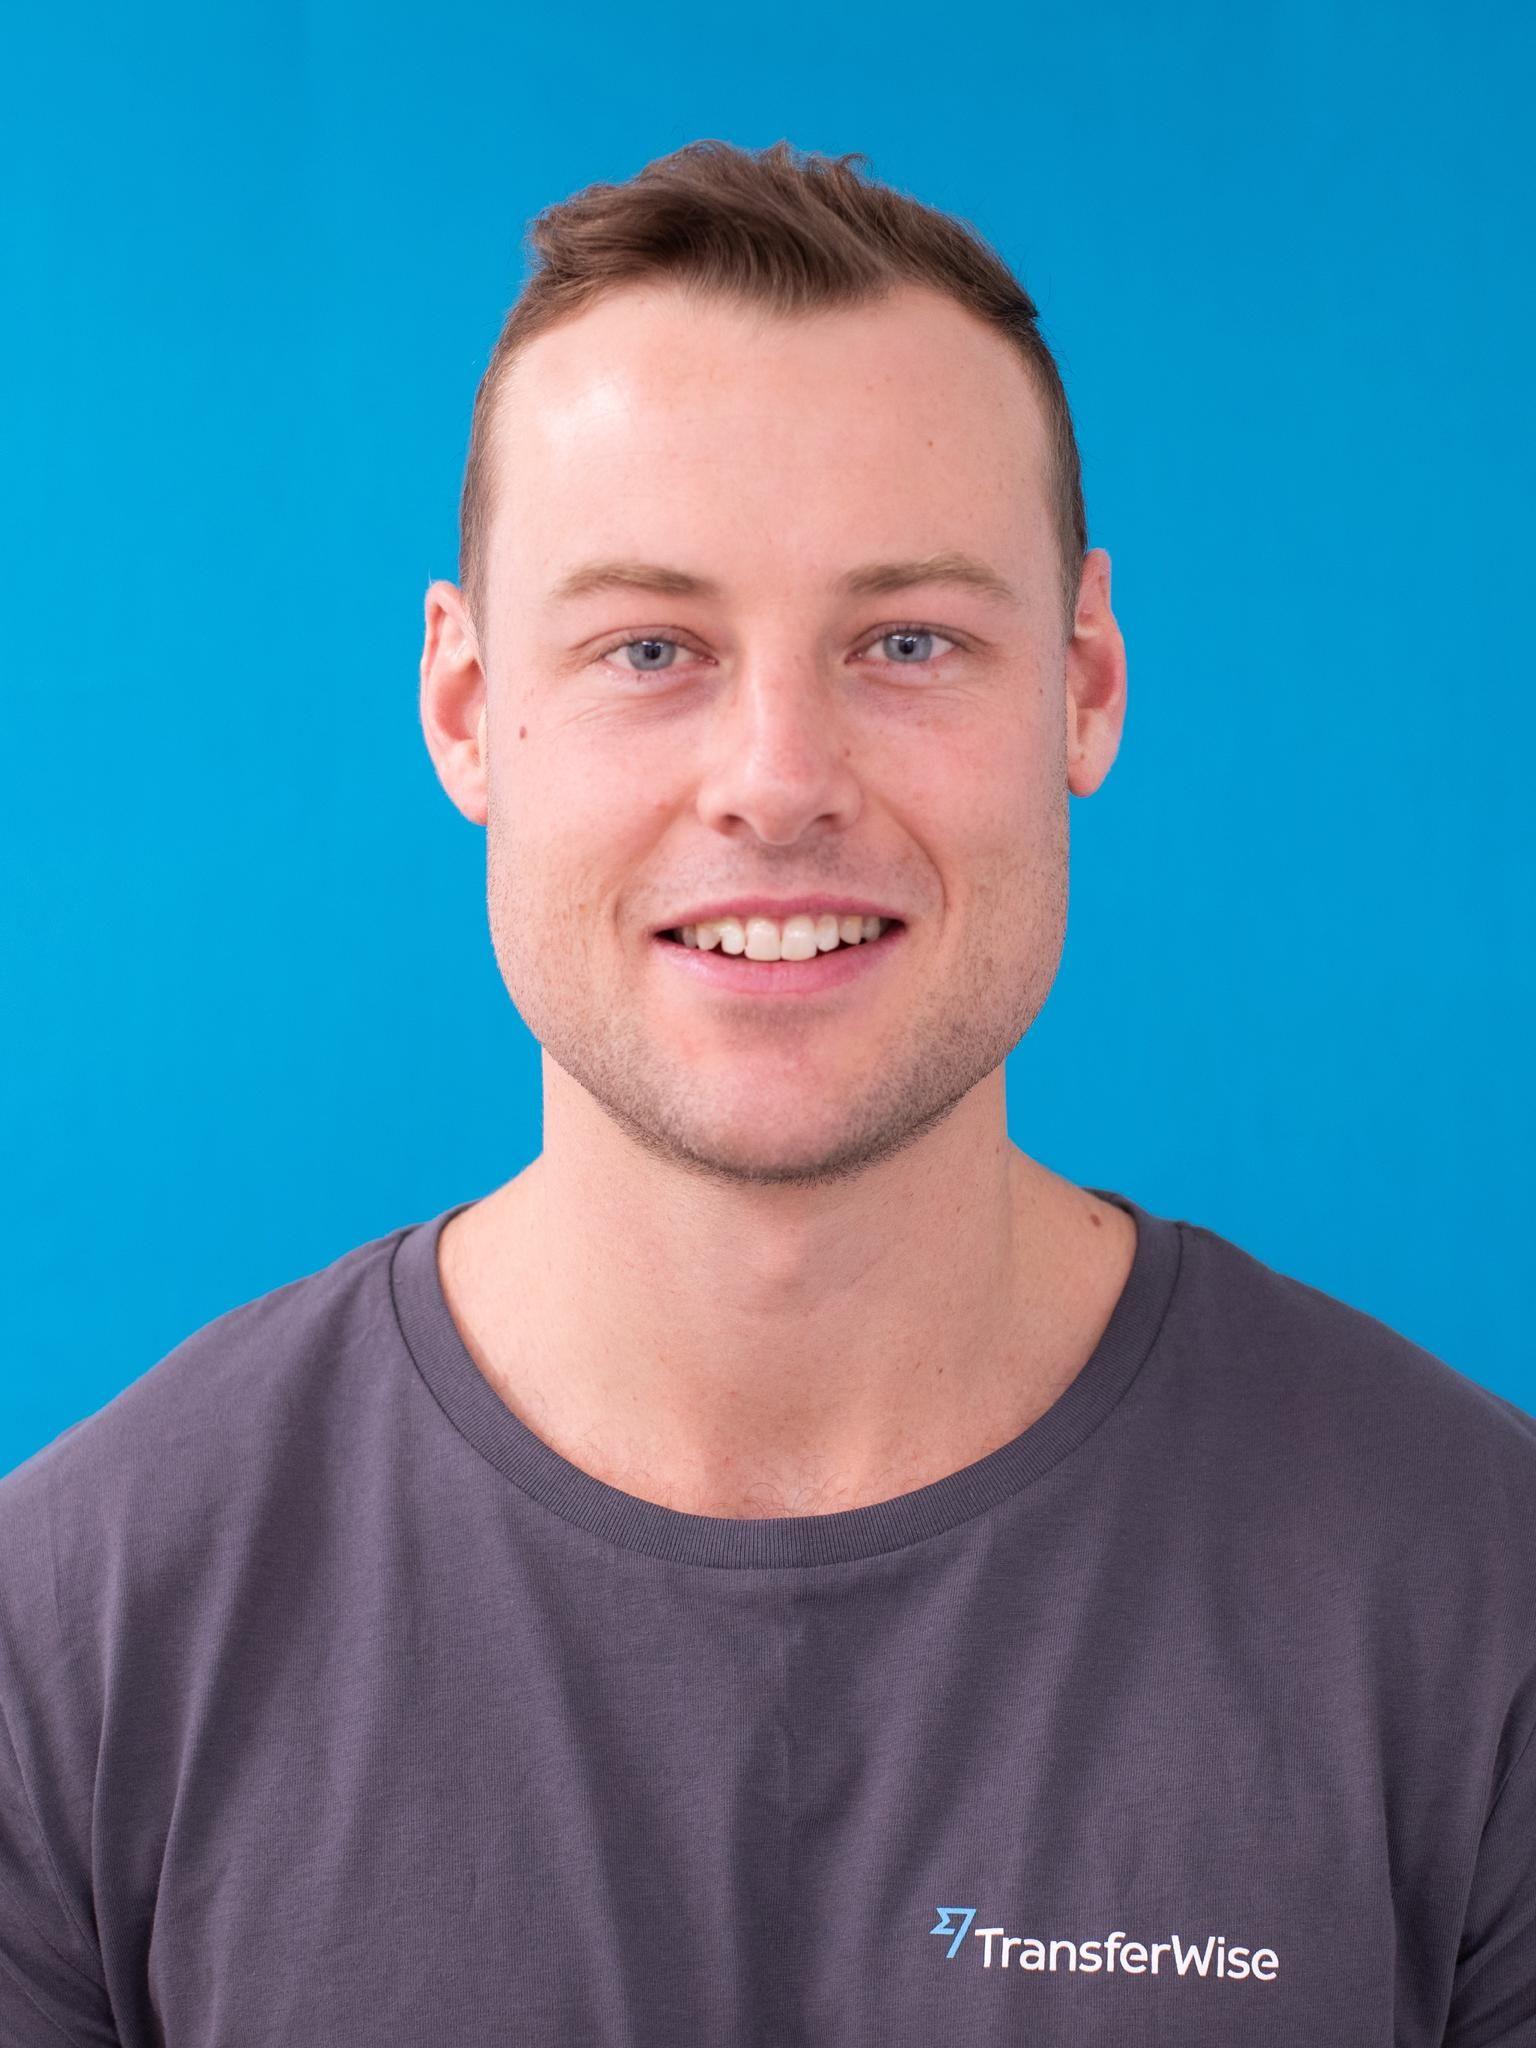 Tim Harley